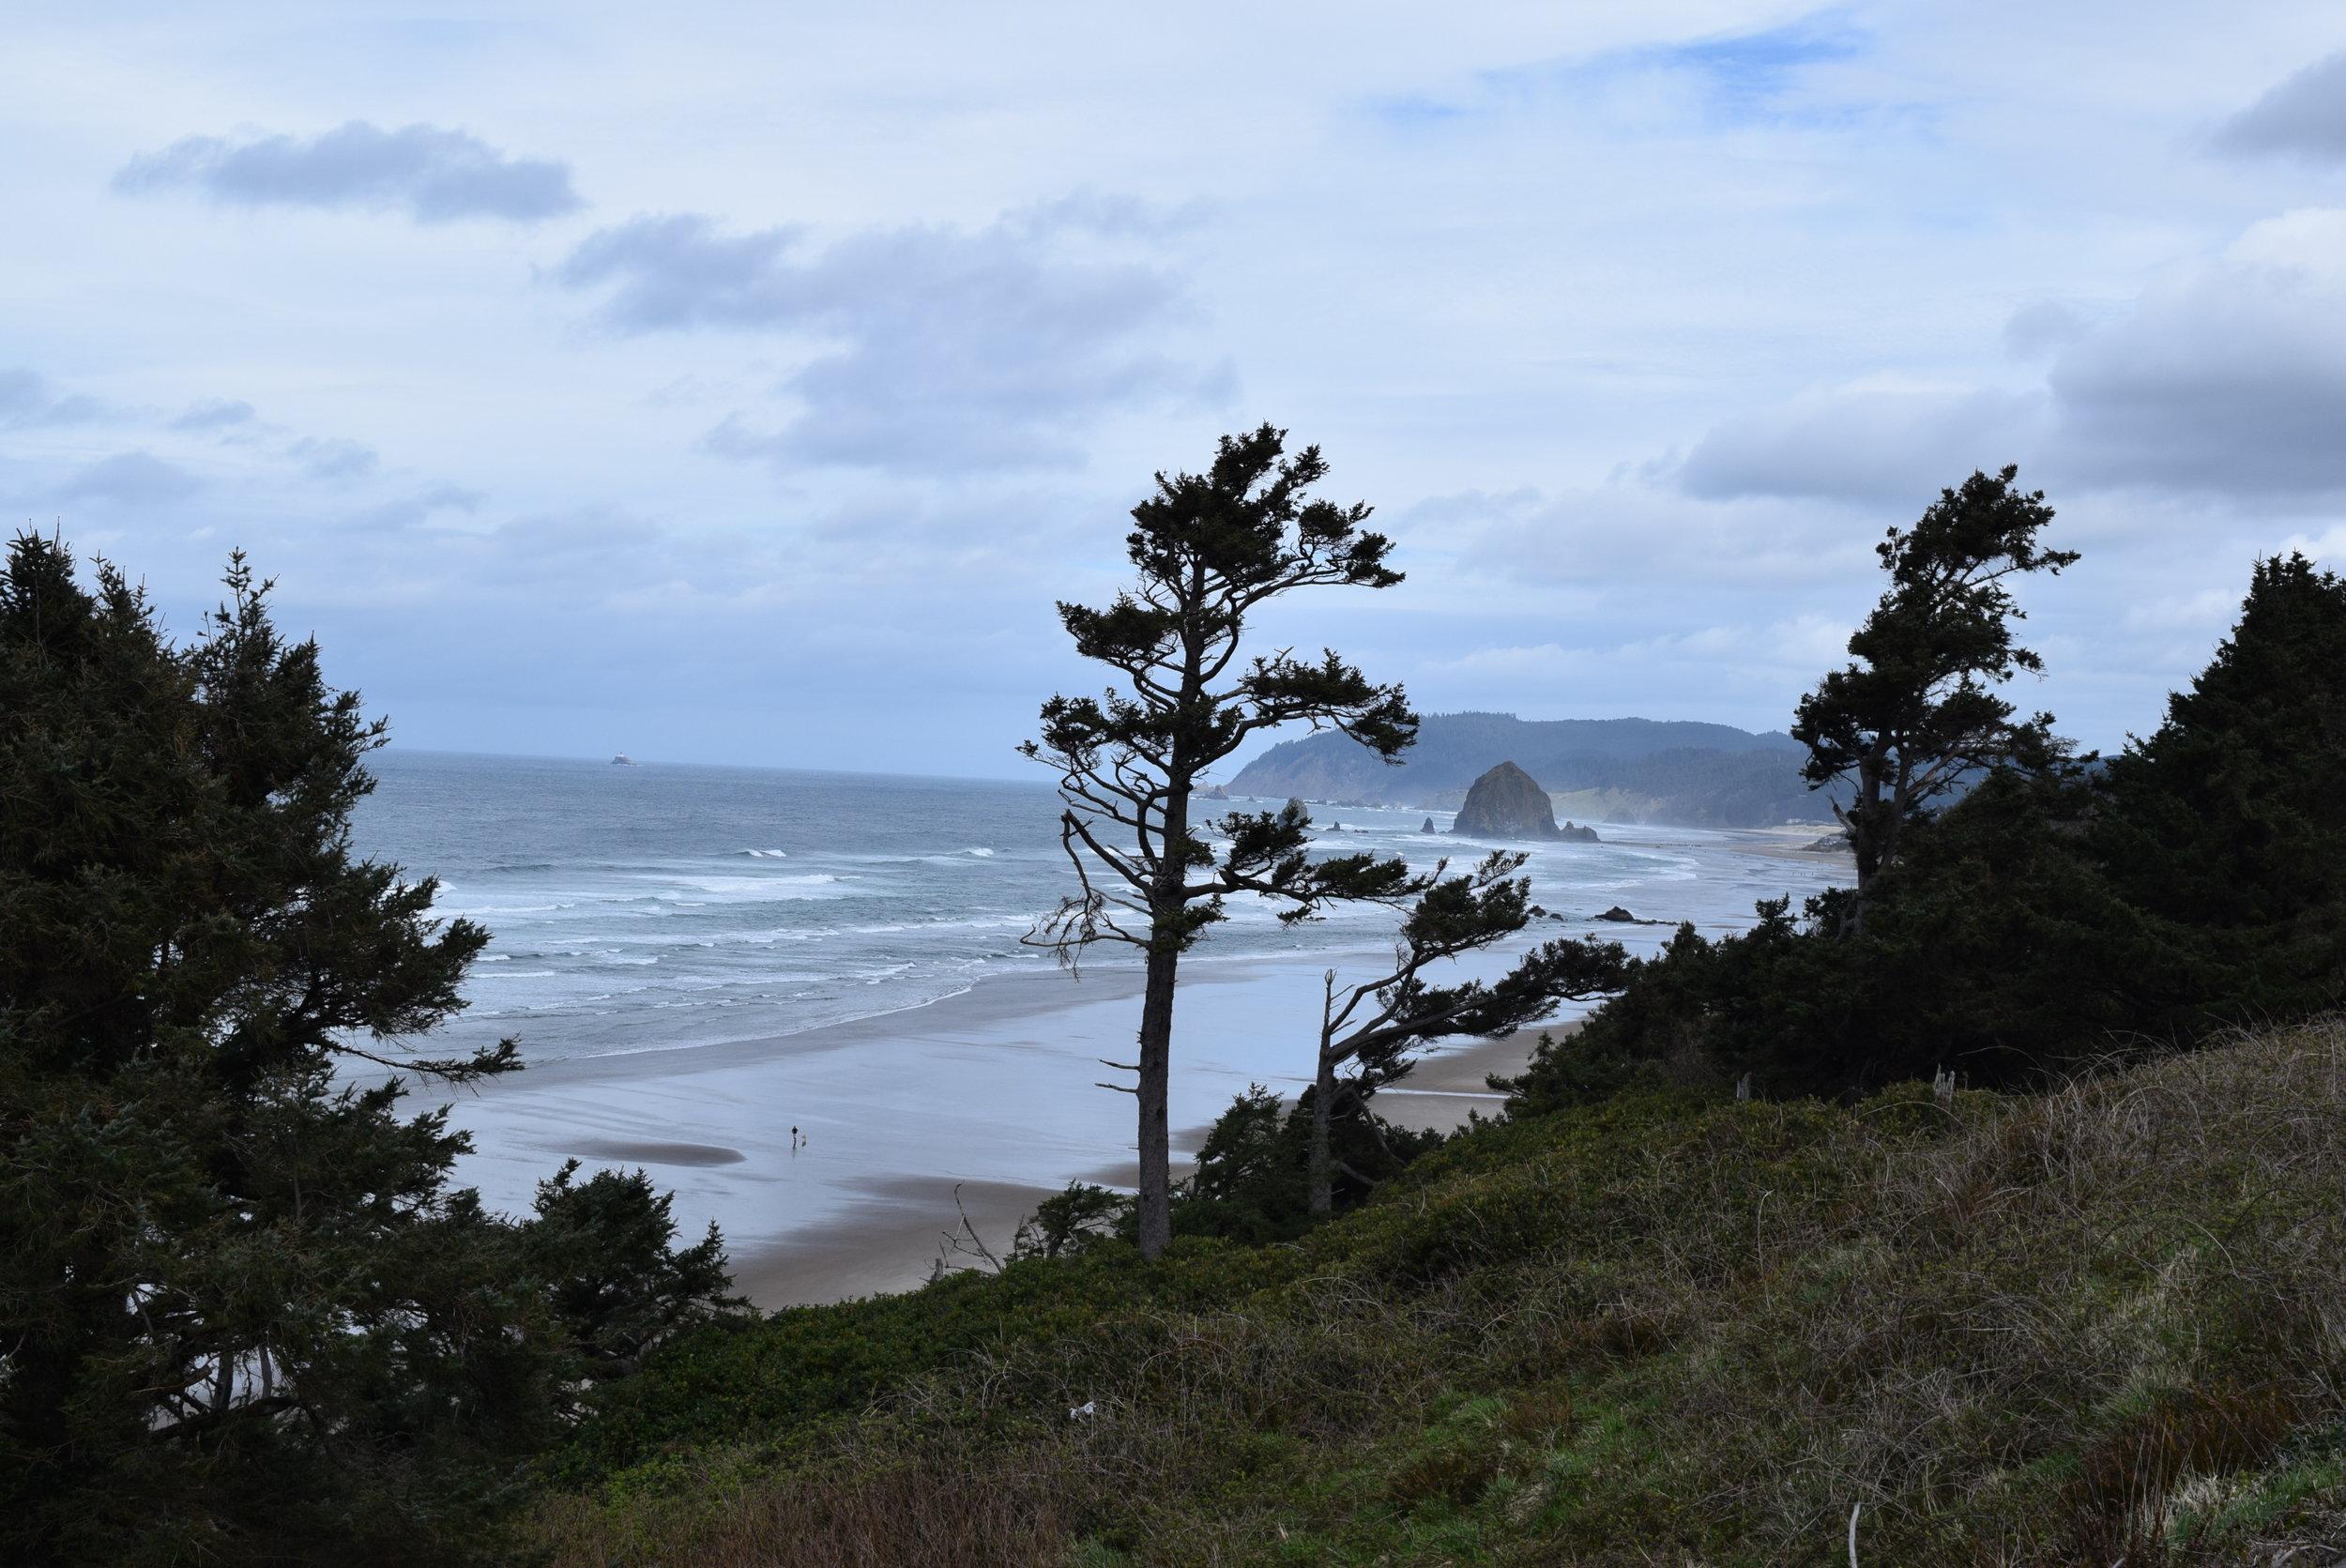 Beautiful views at every turn along the Oregon coast.